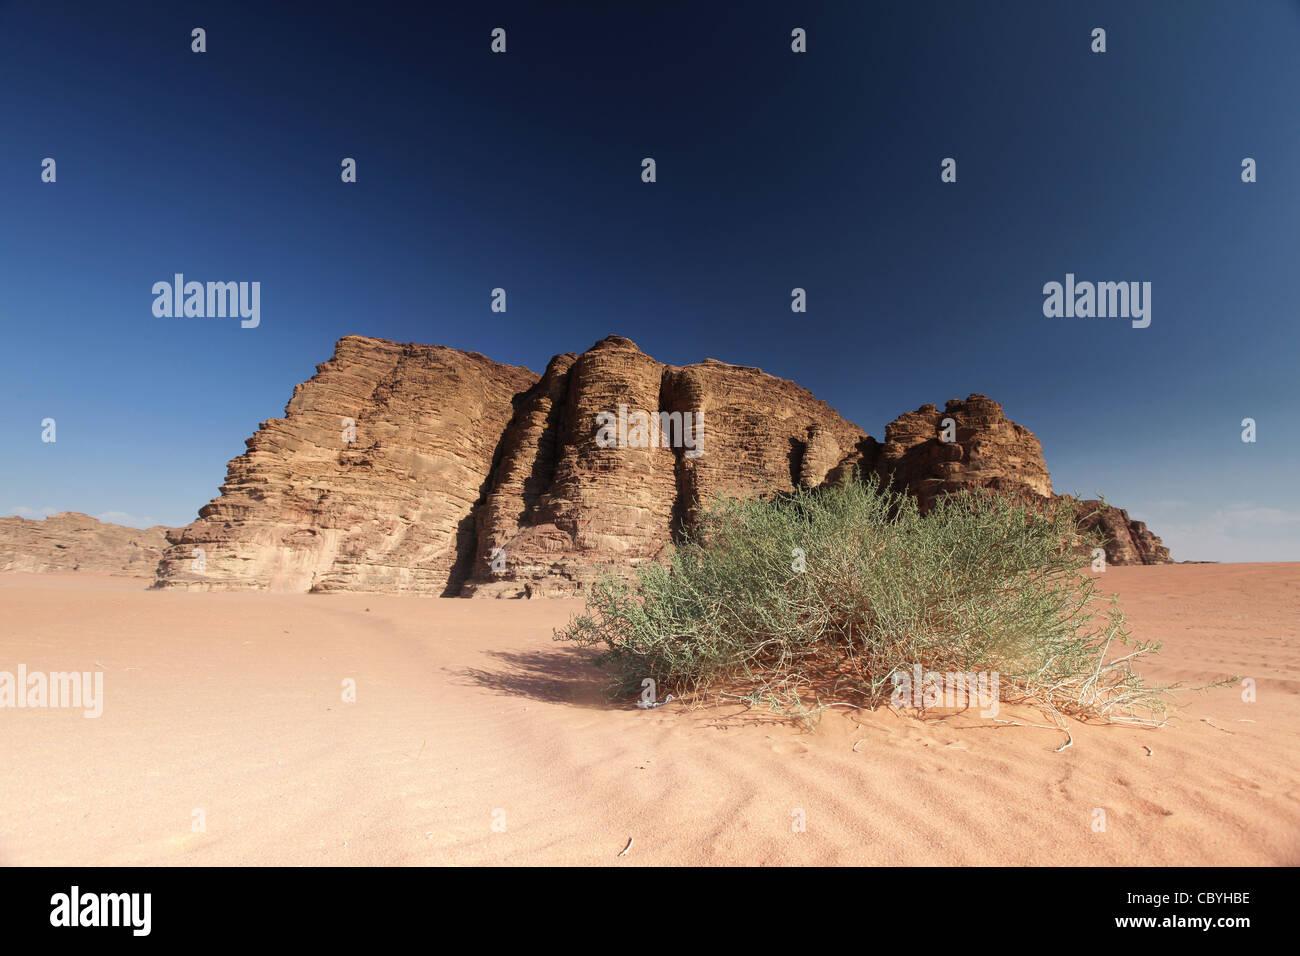 Désert de Wadi Rum, Jordanie Photo Stock